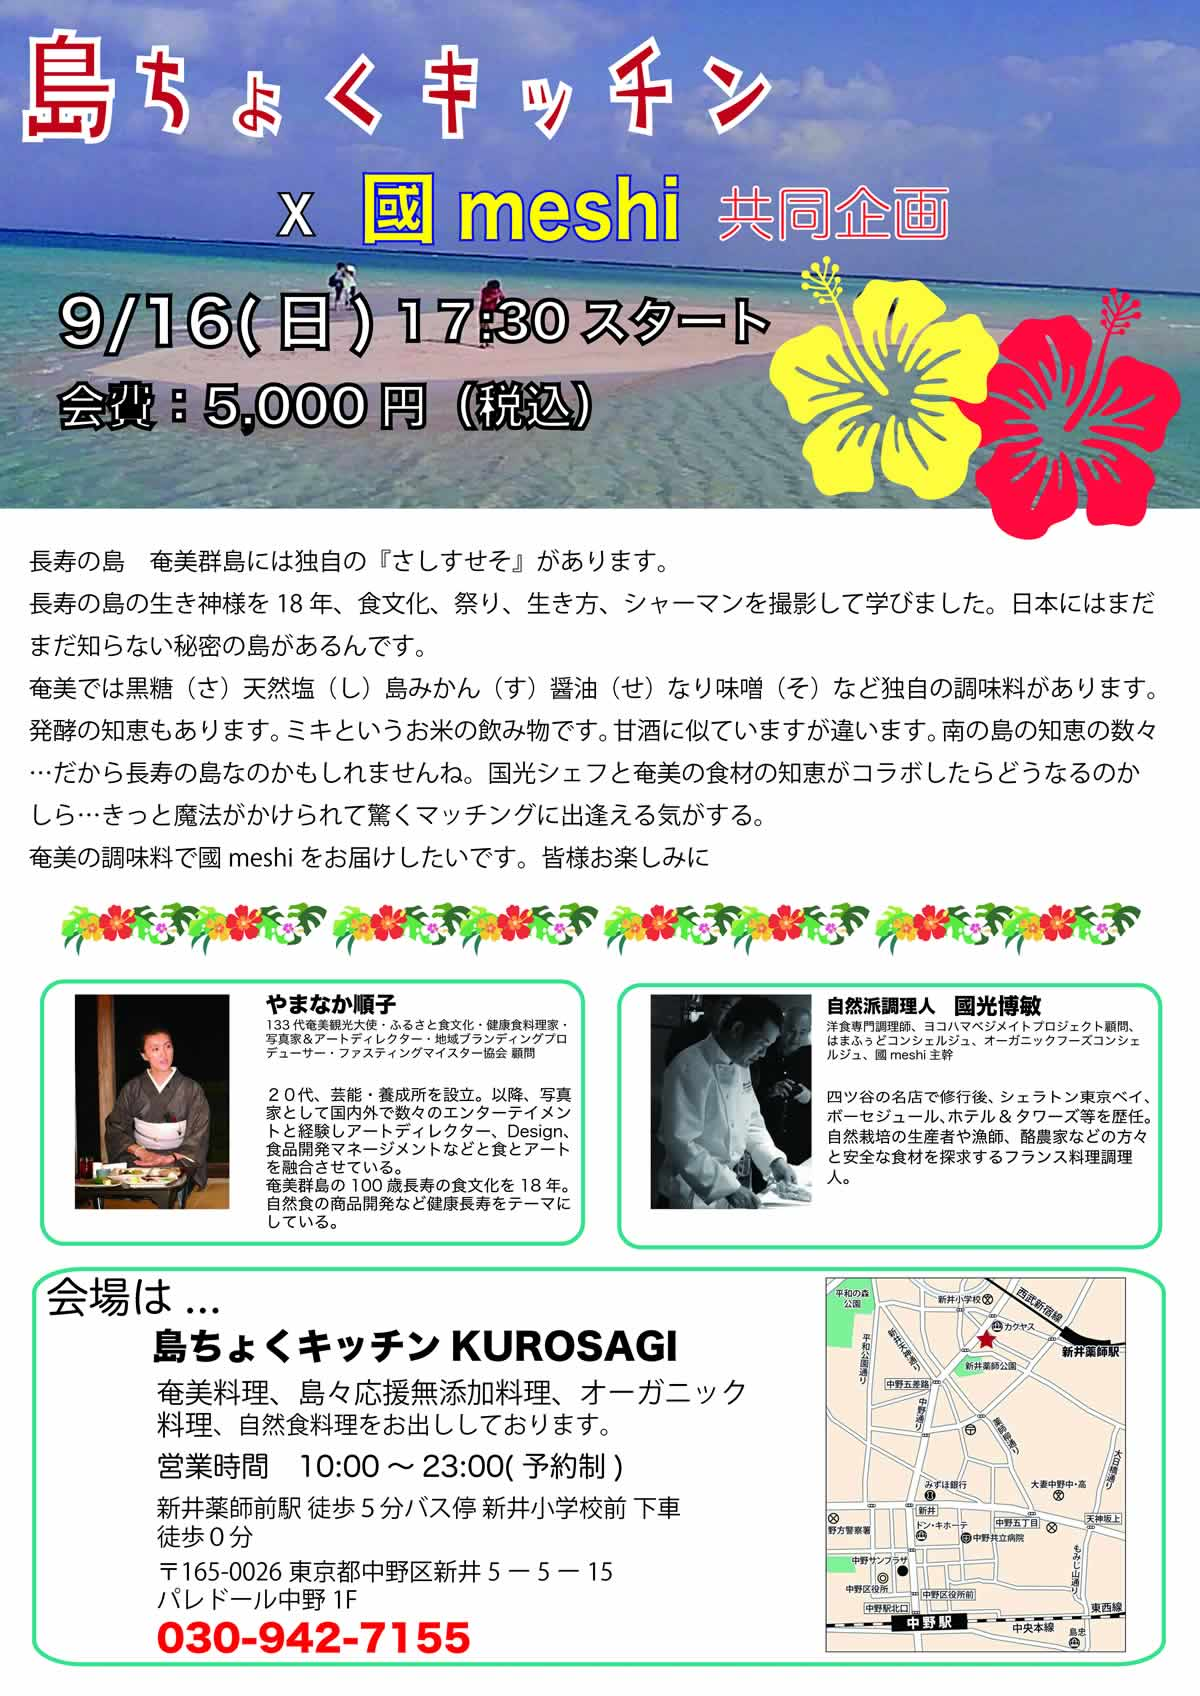 https://shima-choku.com/articles/images/NAKANO_2_09032018%20%28002%29.jpg